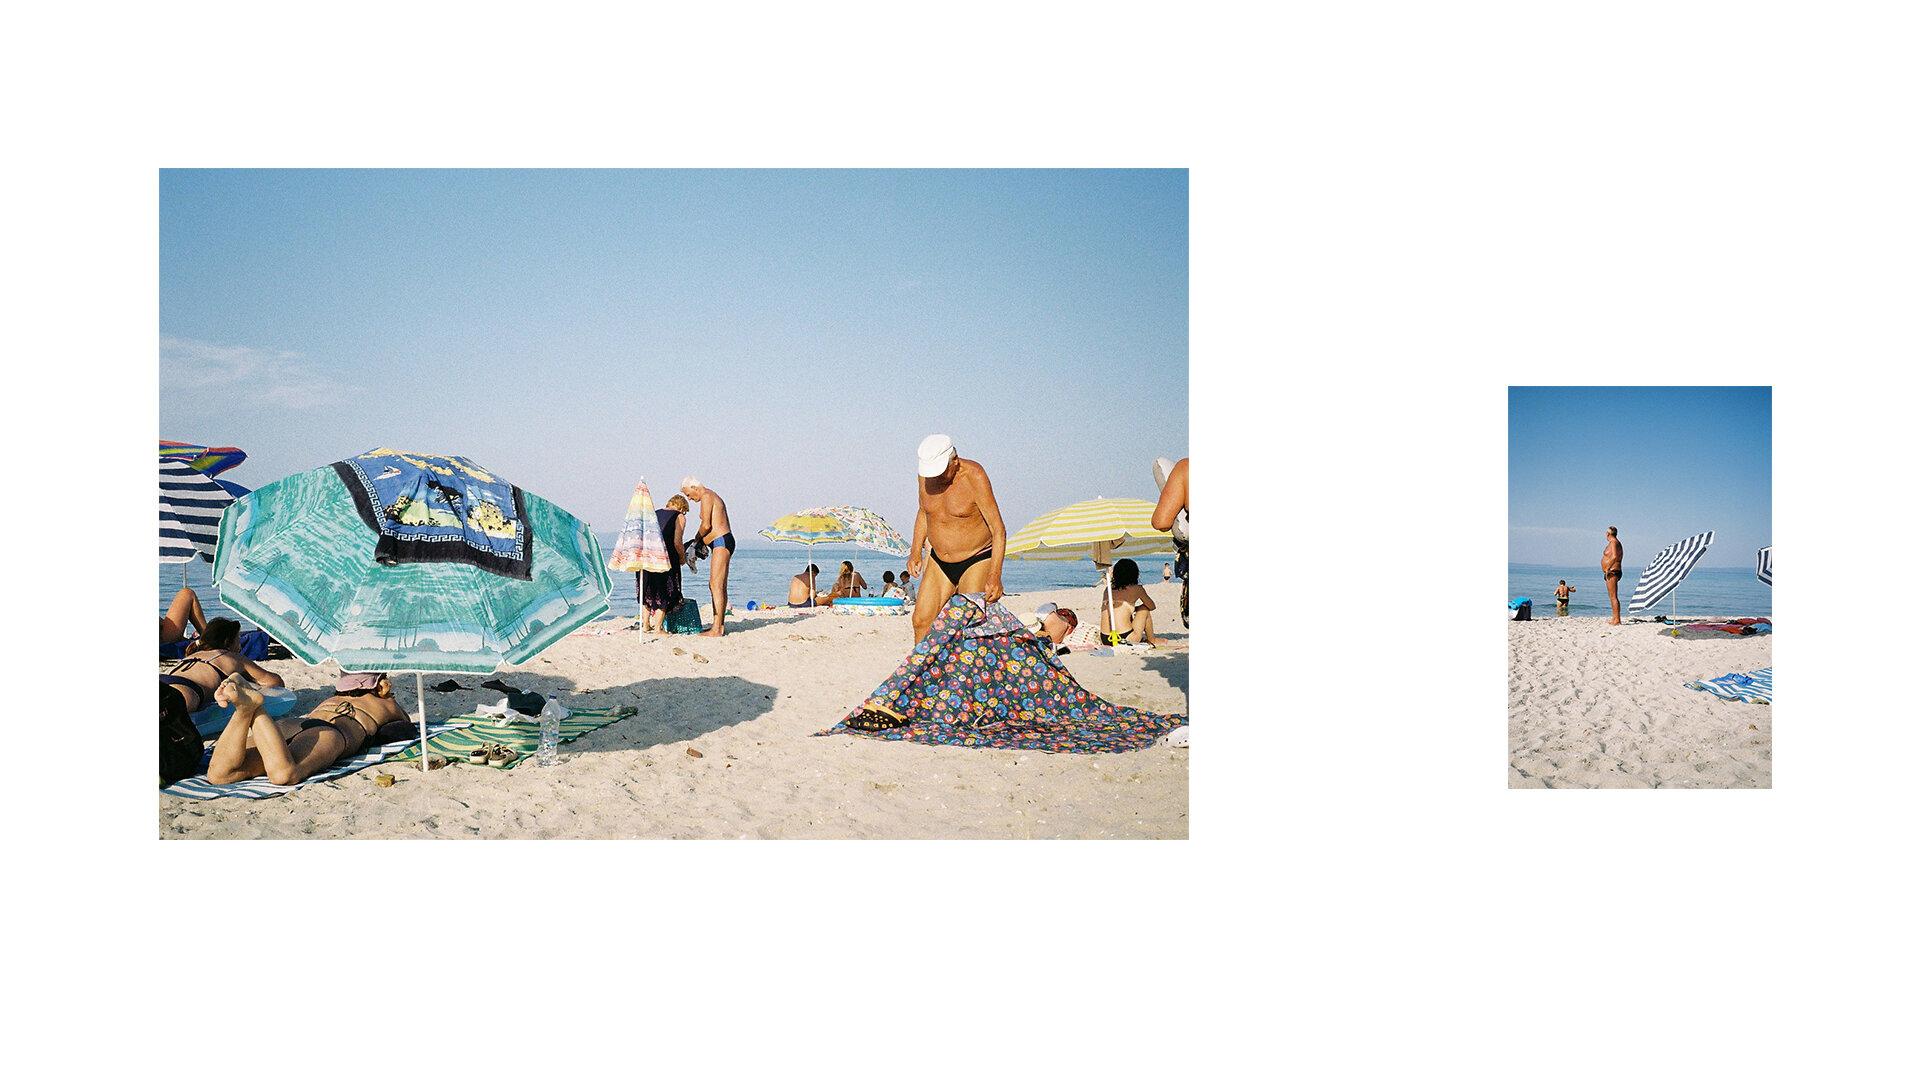 toby-butler-photo-tobybutlerphoto-lifestylephotography-travel-travelphotography-lifestyle-tourism-greece-film-35mm-magazine-europe-mediterranean-ocean-3.jpg